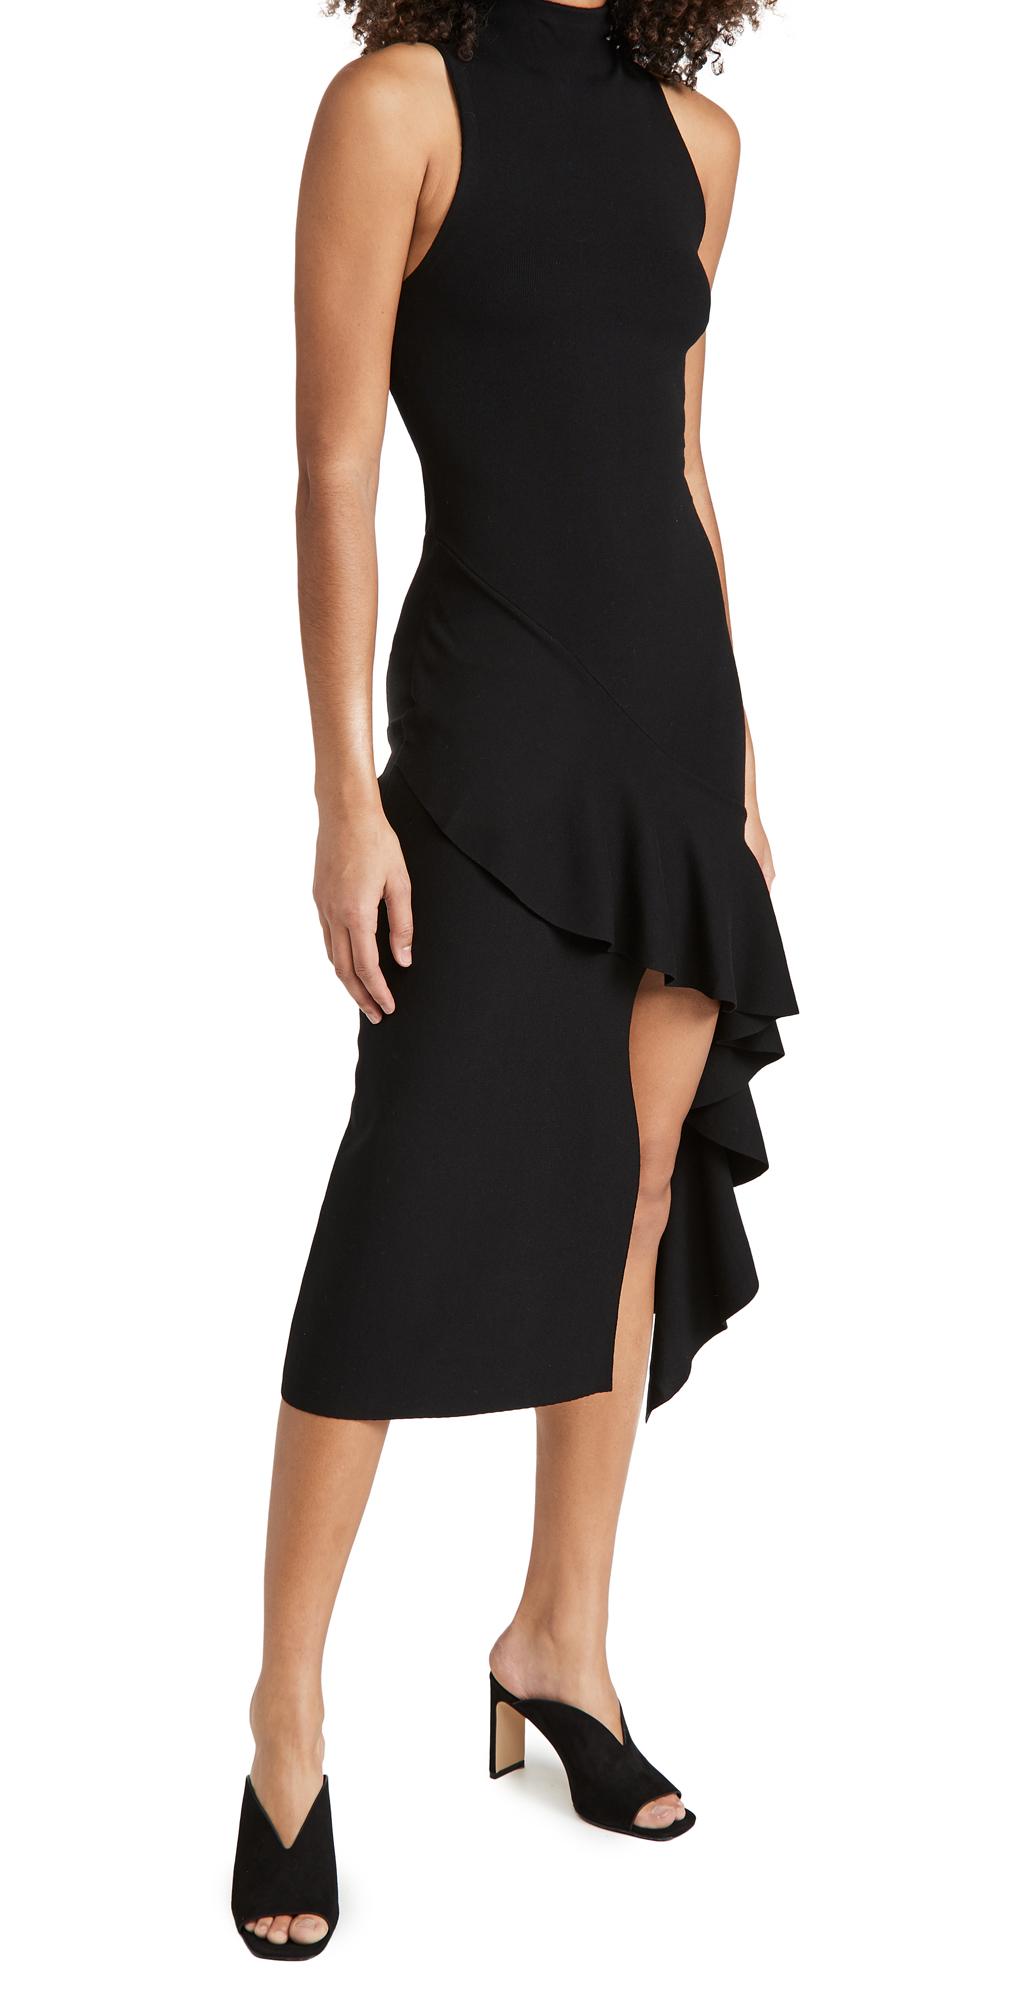 alice + olivia Angelia Double Knit Ruffle Dress